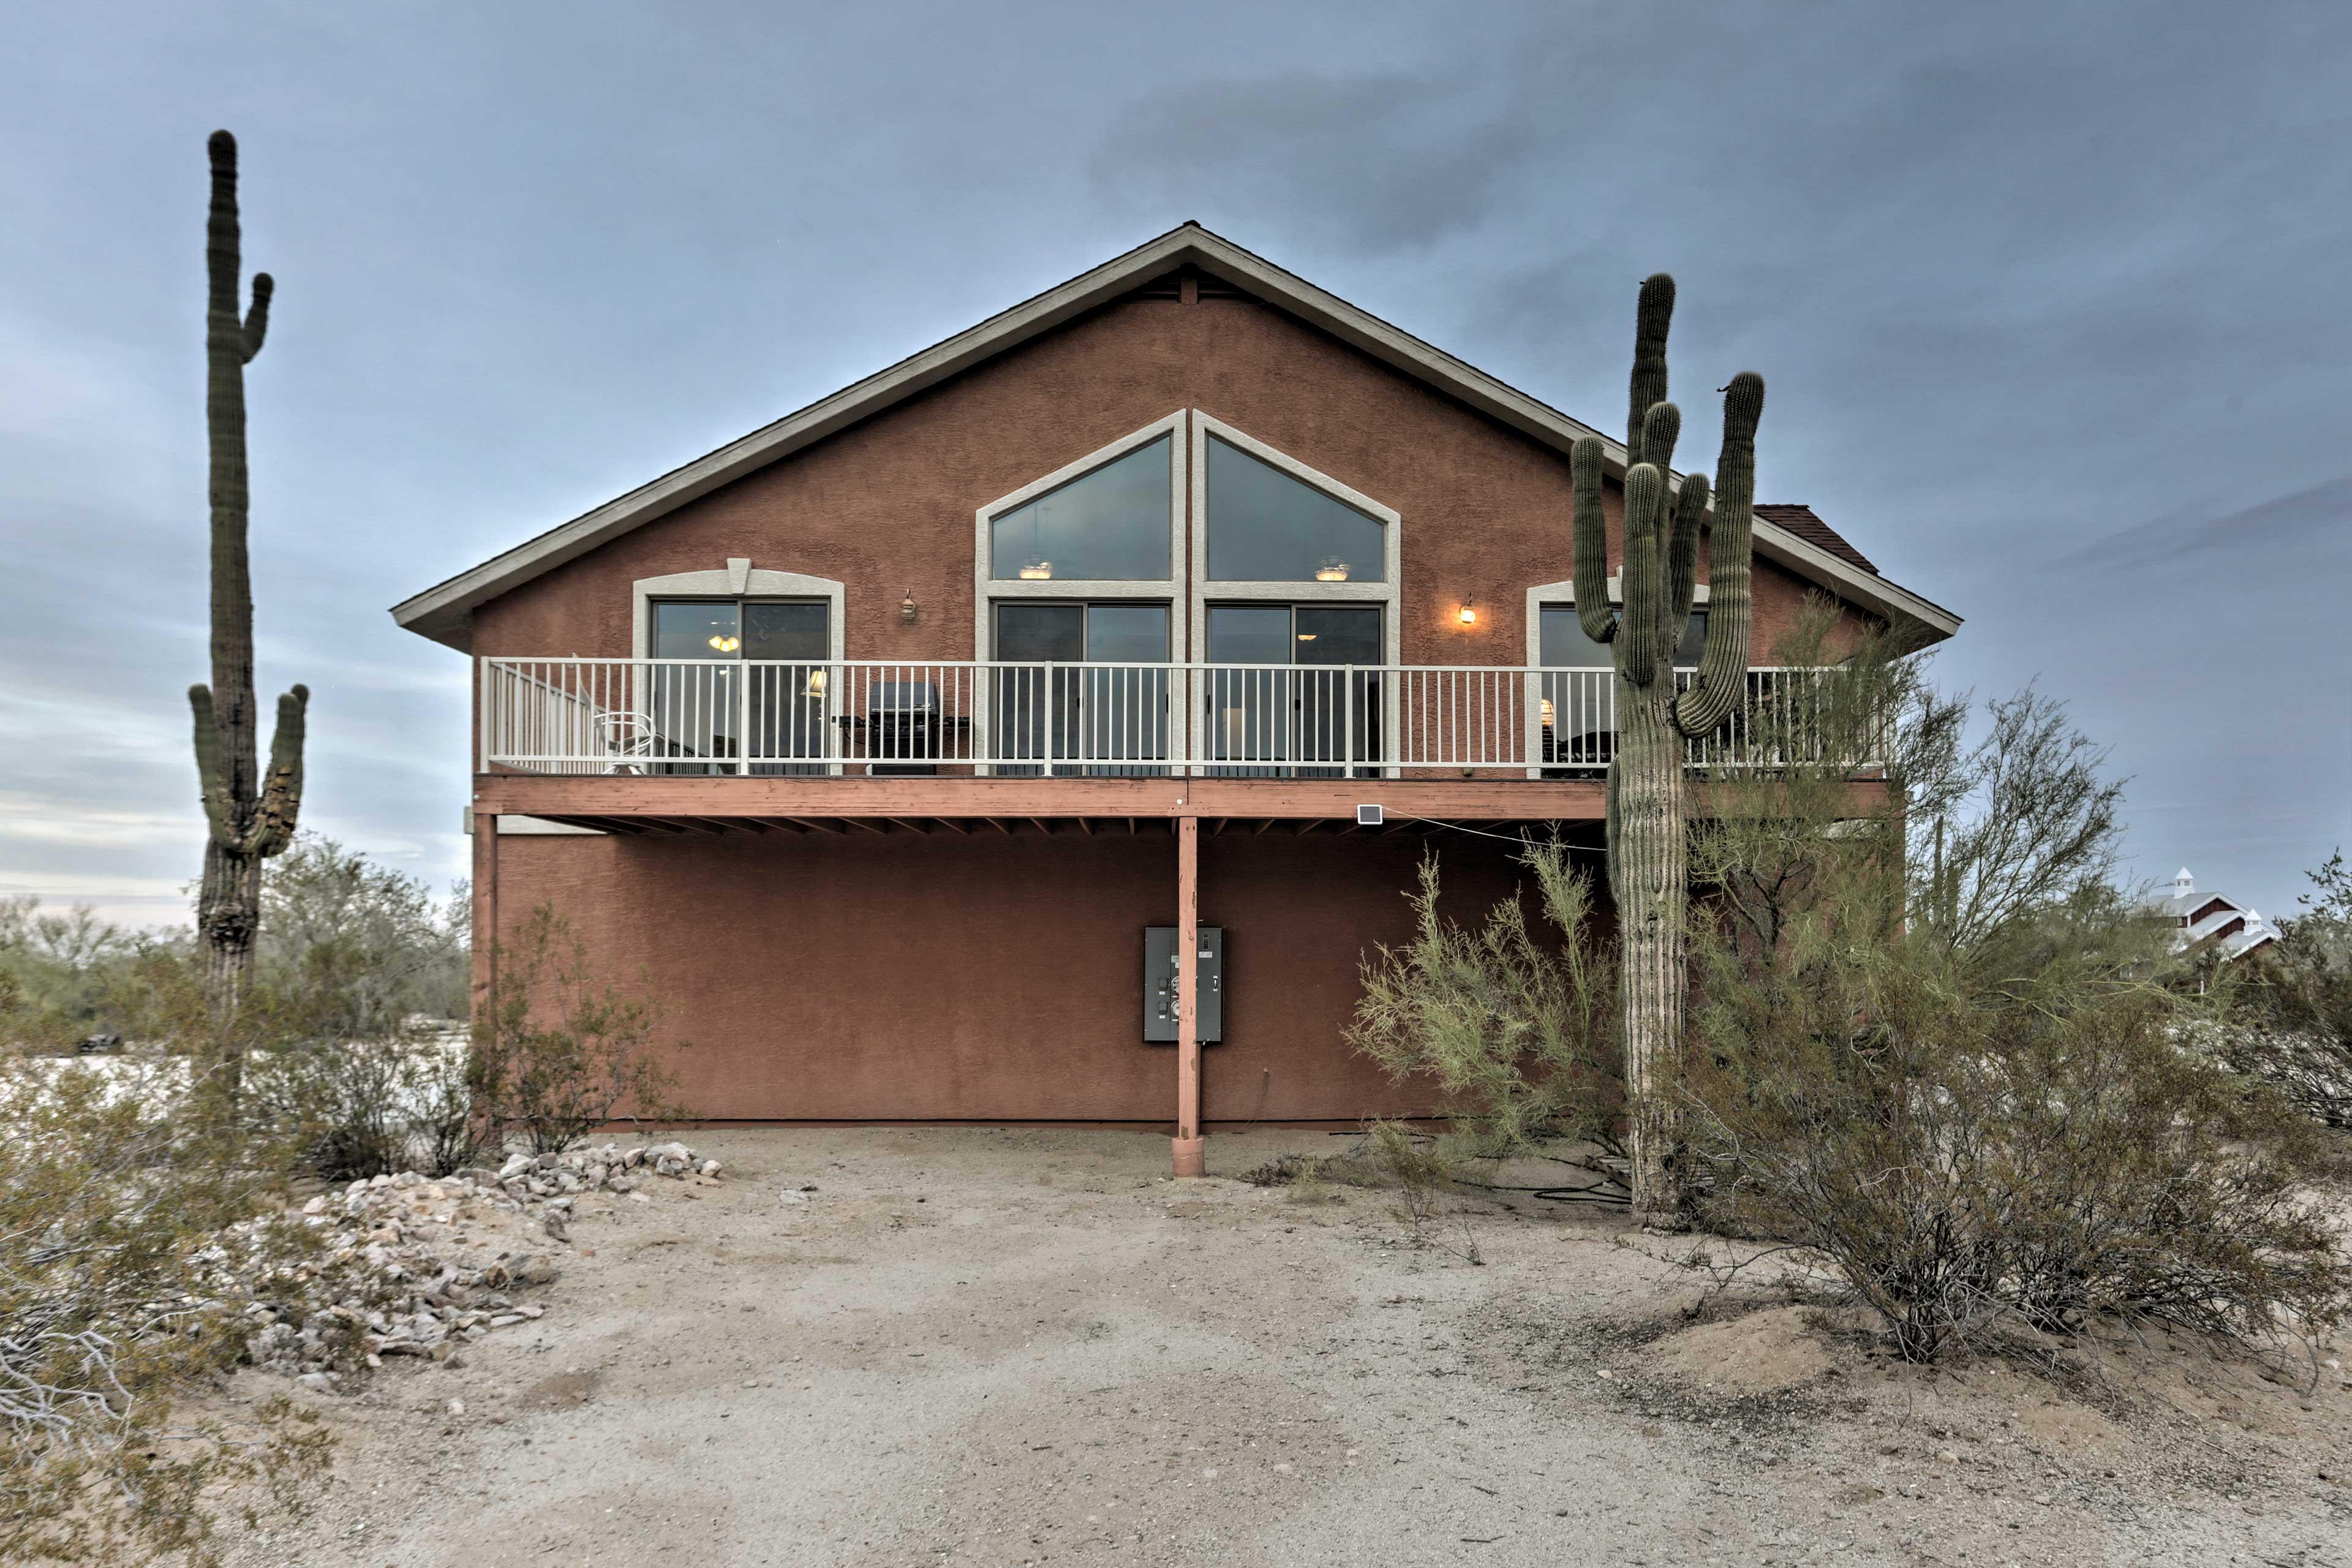 Essential amenities make you feel at home in Arizona's Sonoran Desert.